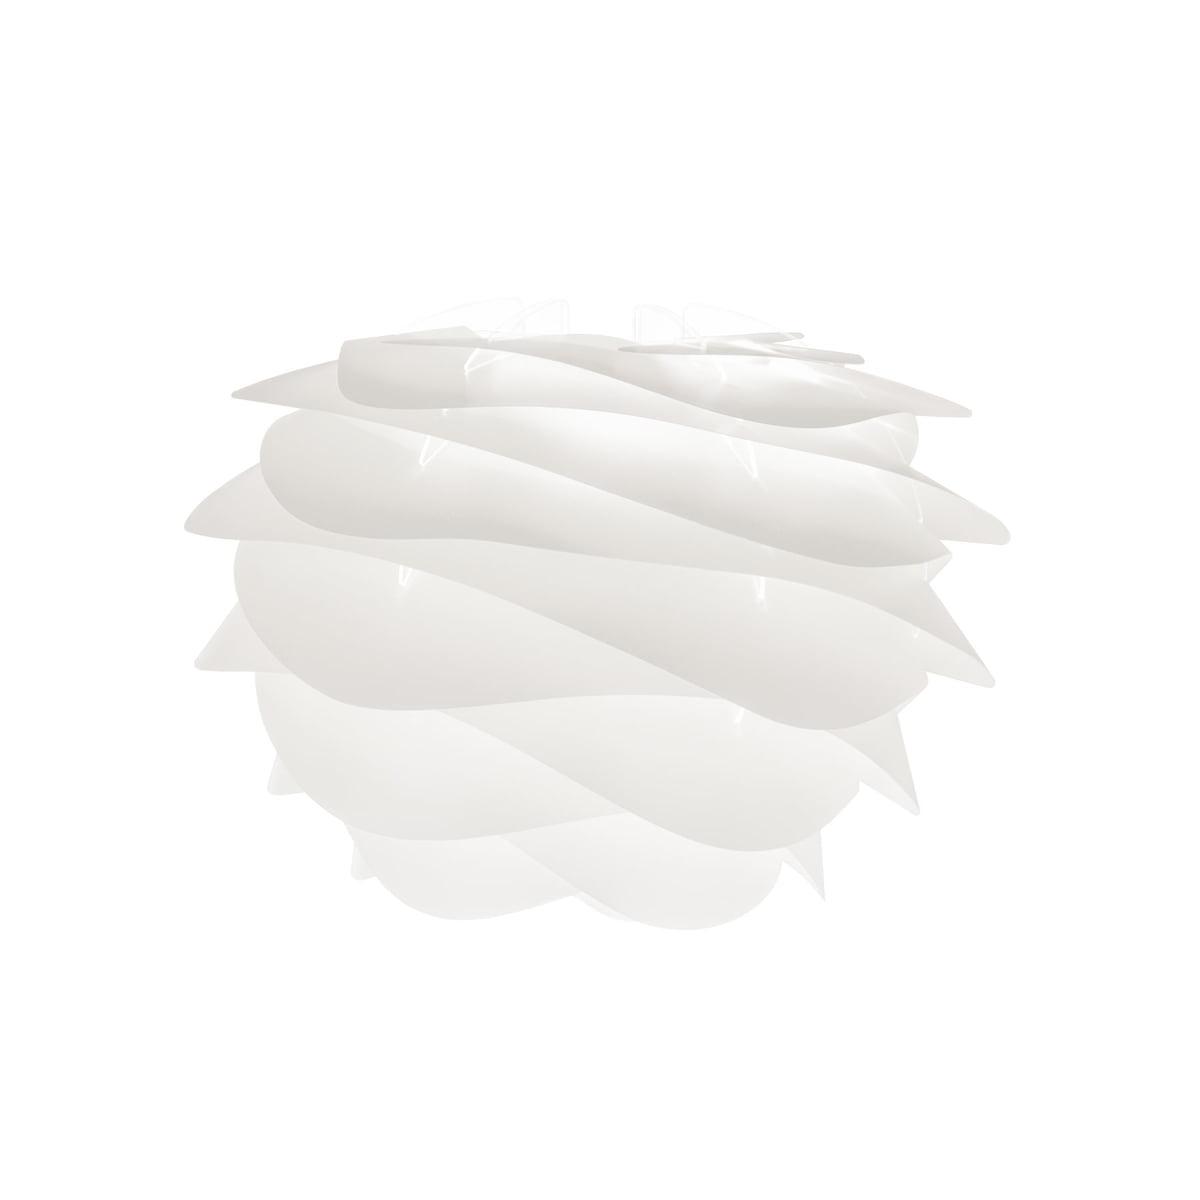 https://www.connox.de/m/100030/192829/media/Vita/Carmina/Vita-02057-Carmina-nini-white-freisteller-01.jpg